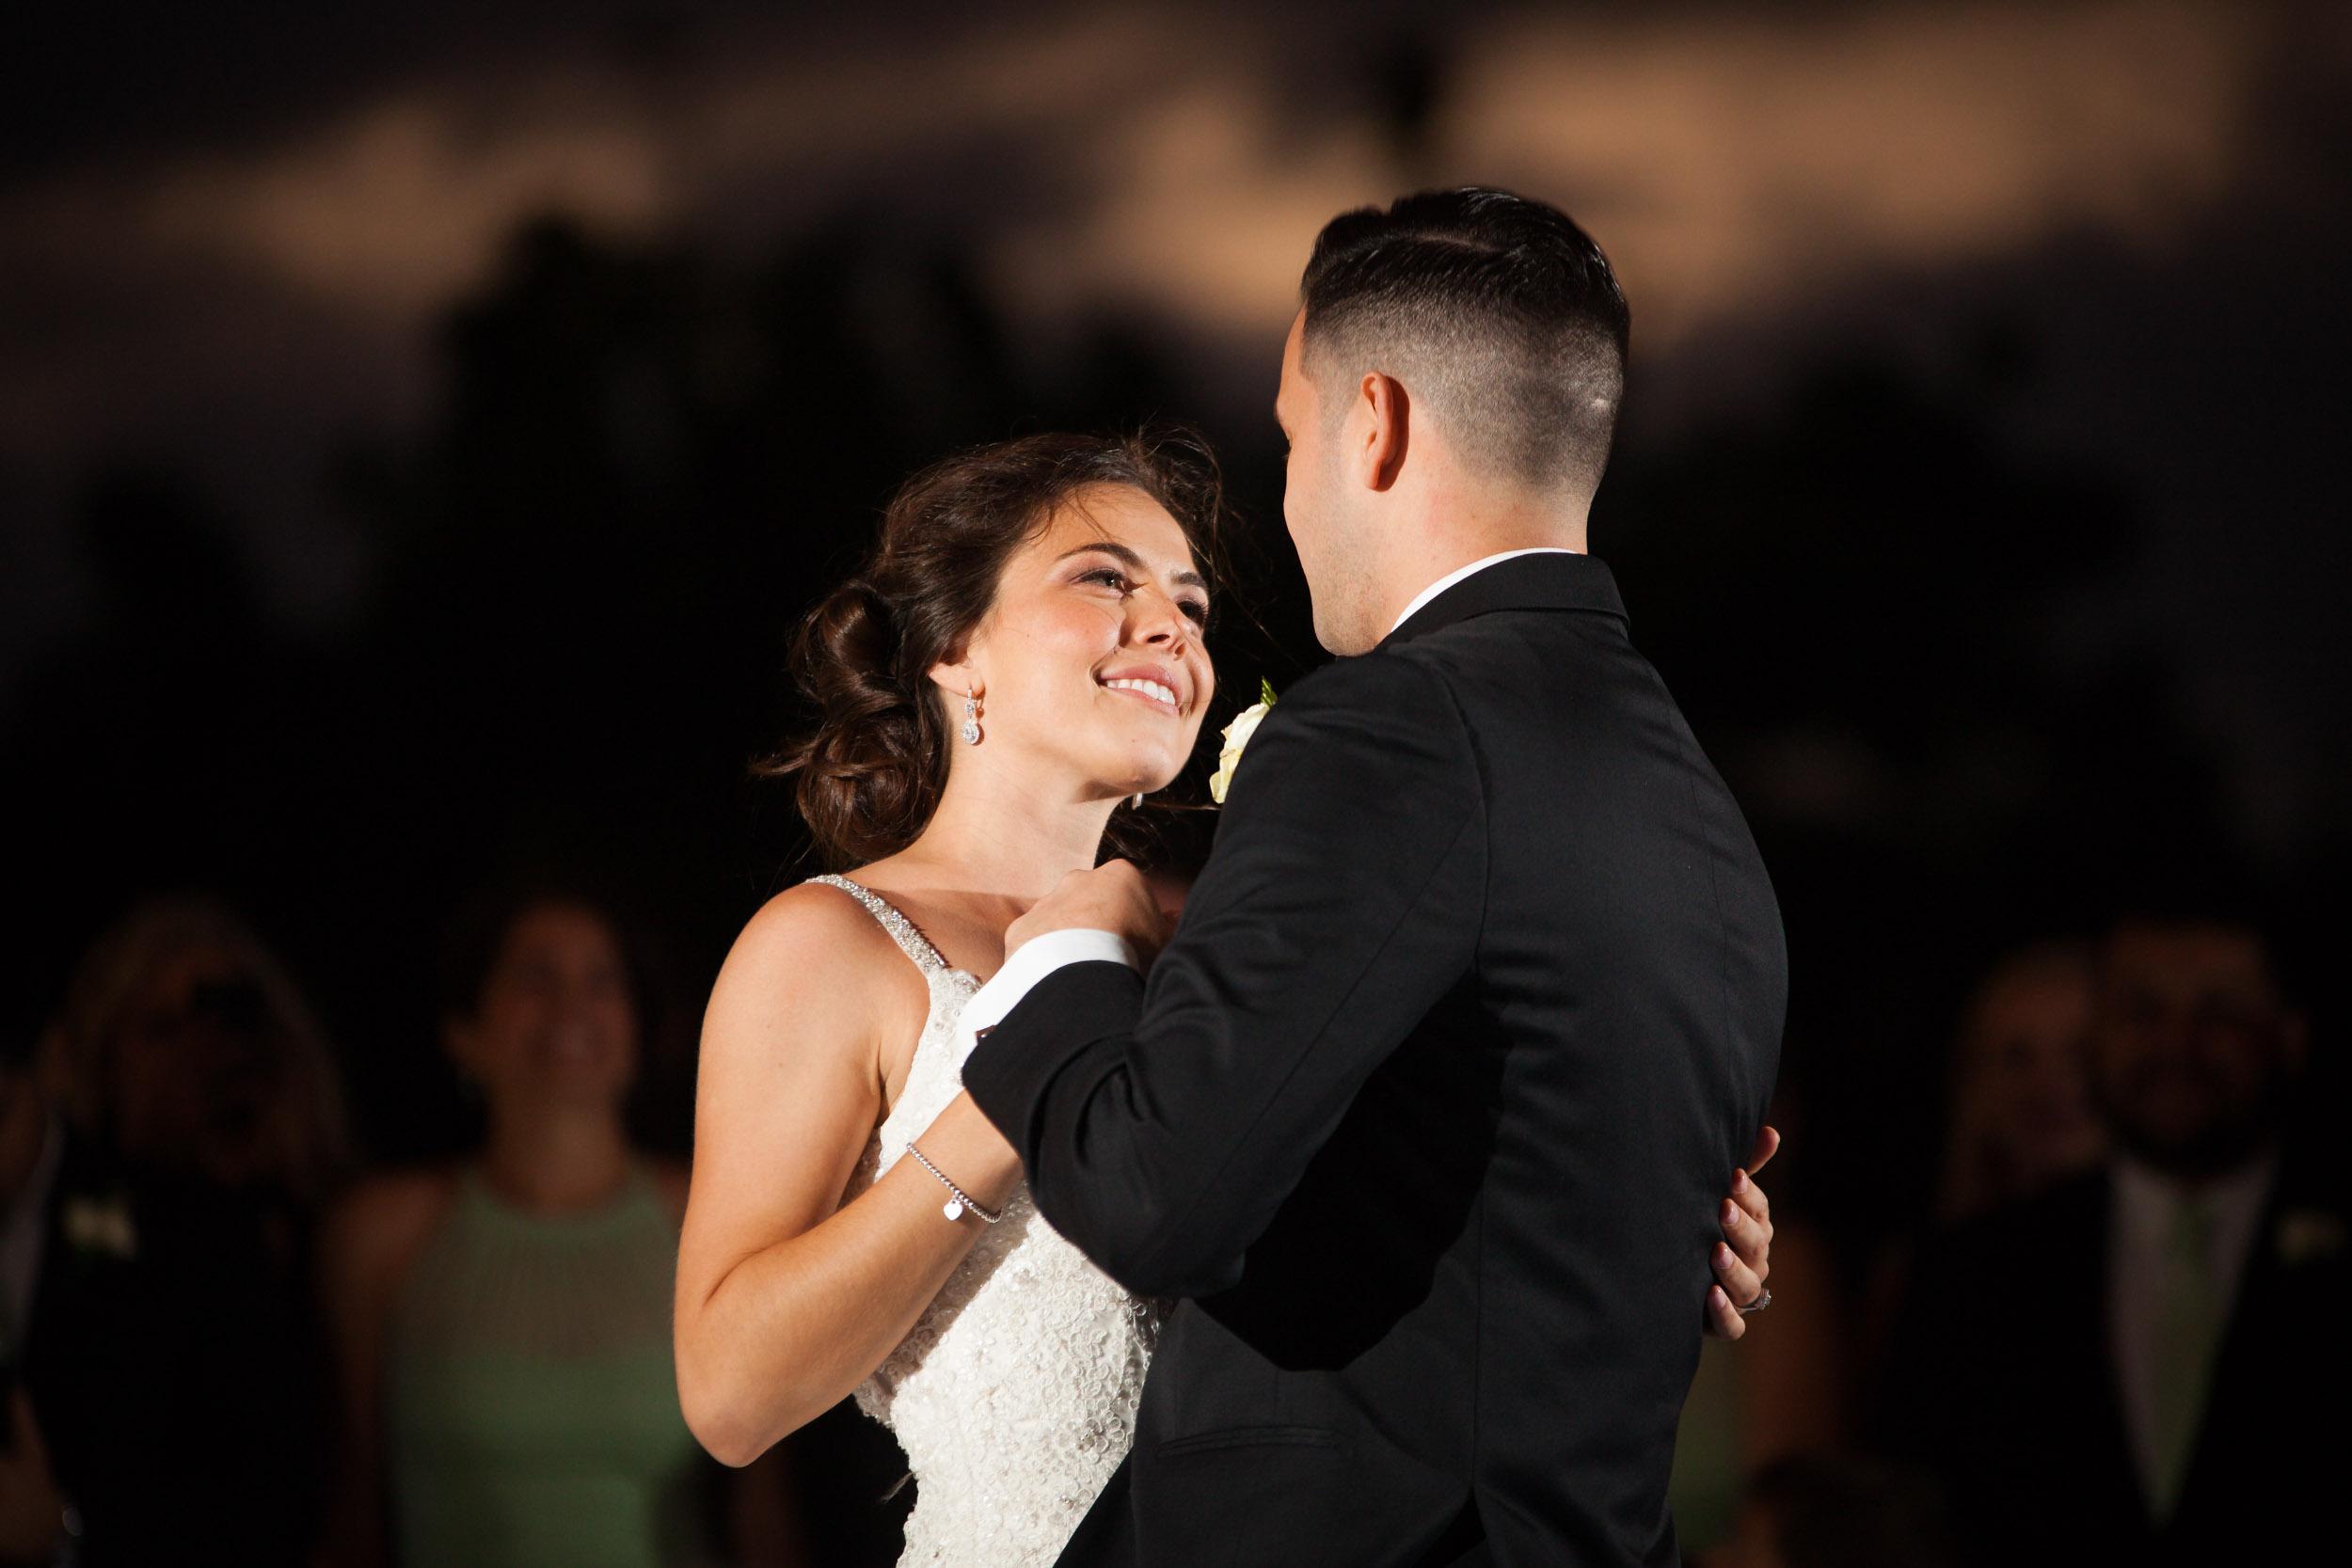 Flordia-Wedding-Photography-57.jpg